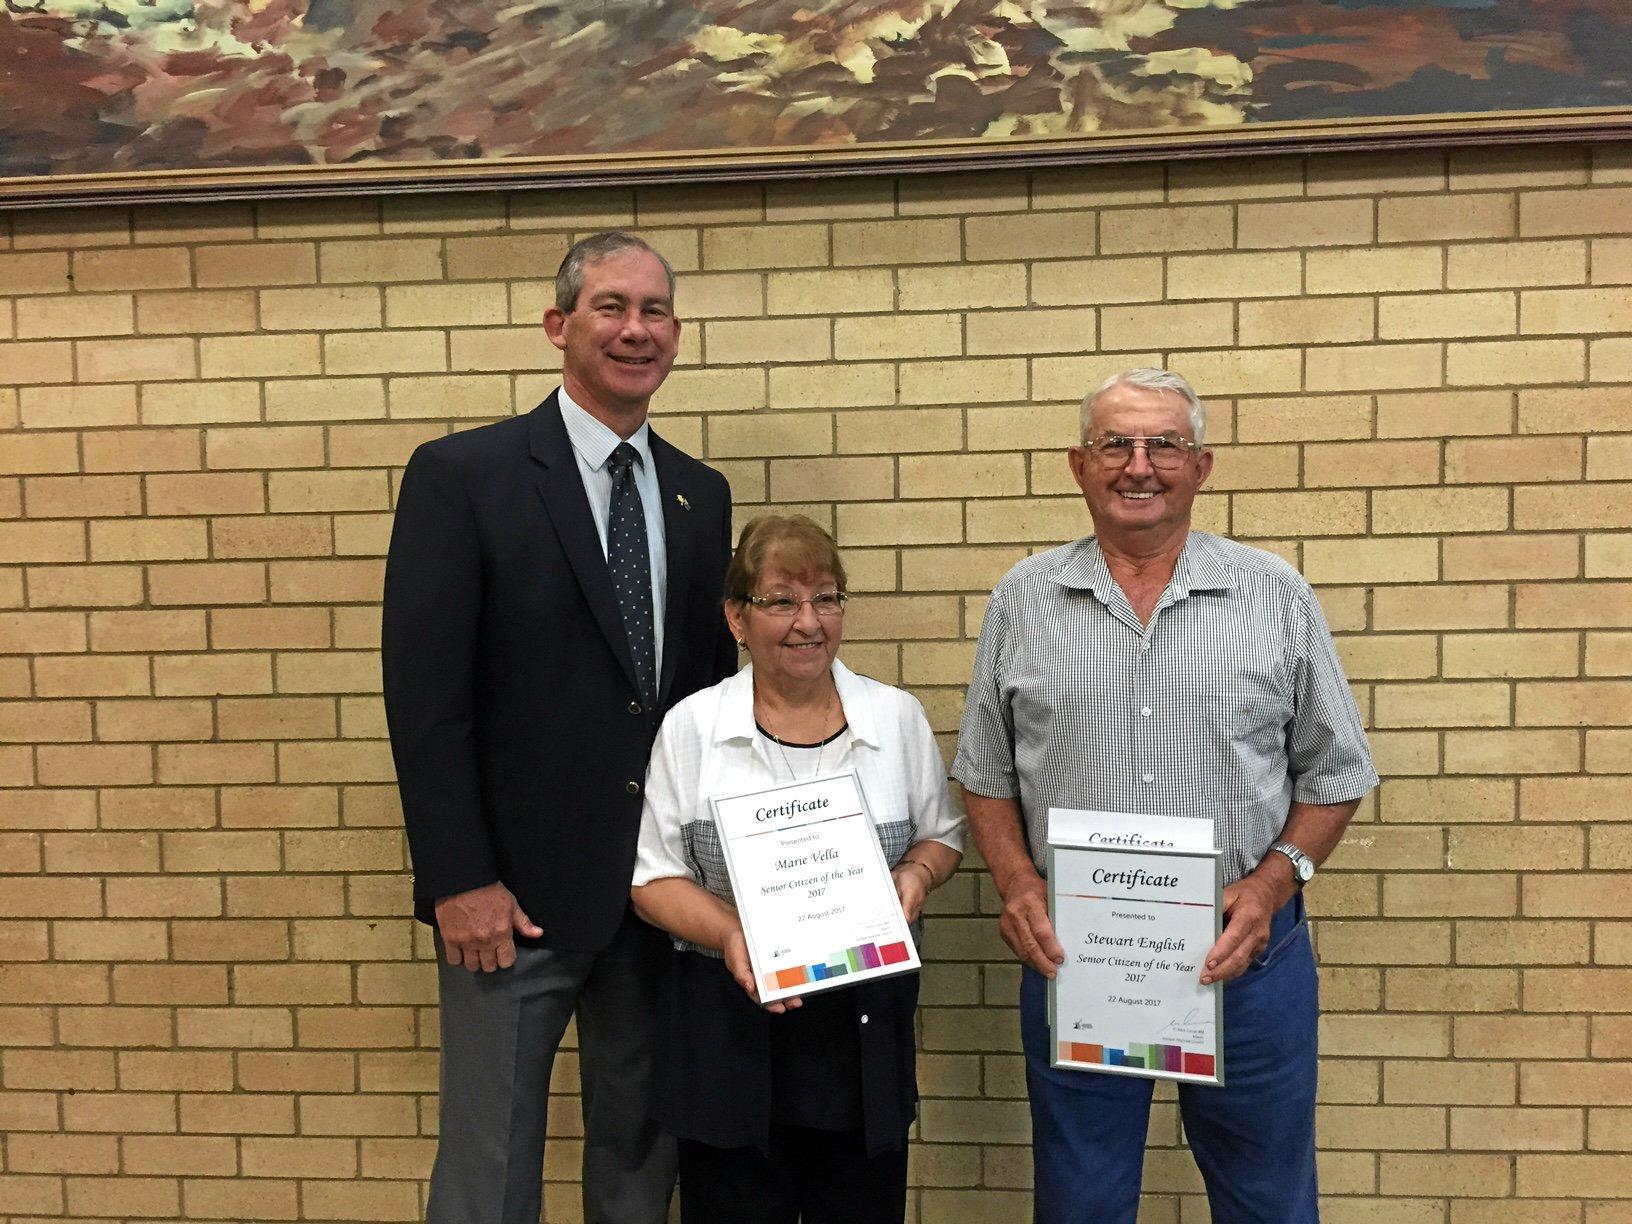 Mayor Mick Curran with Senior Citizen award winners Maria Vella and Stewart English.